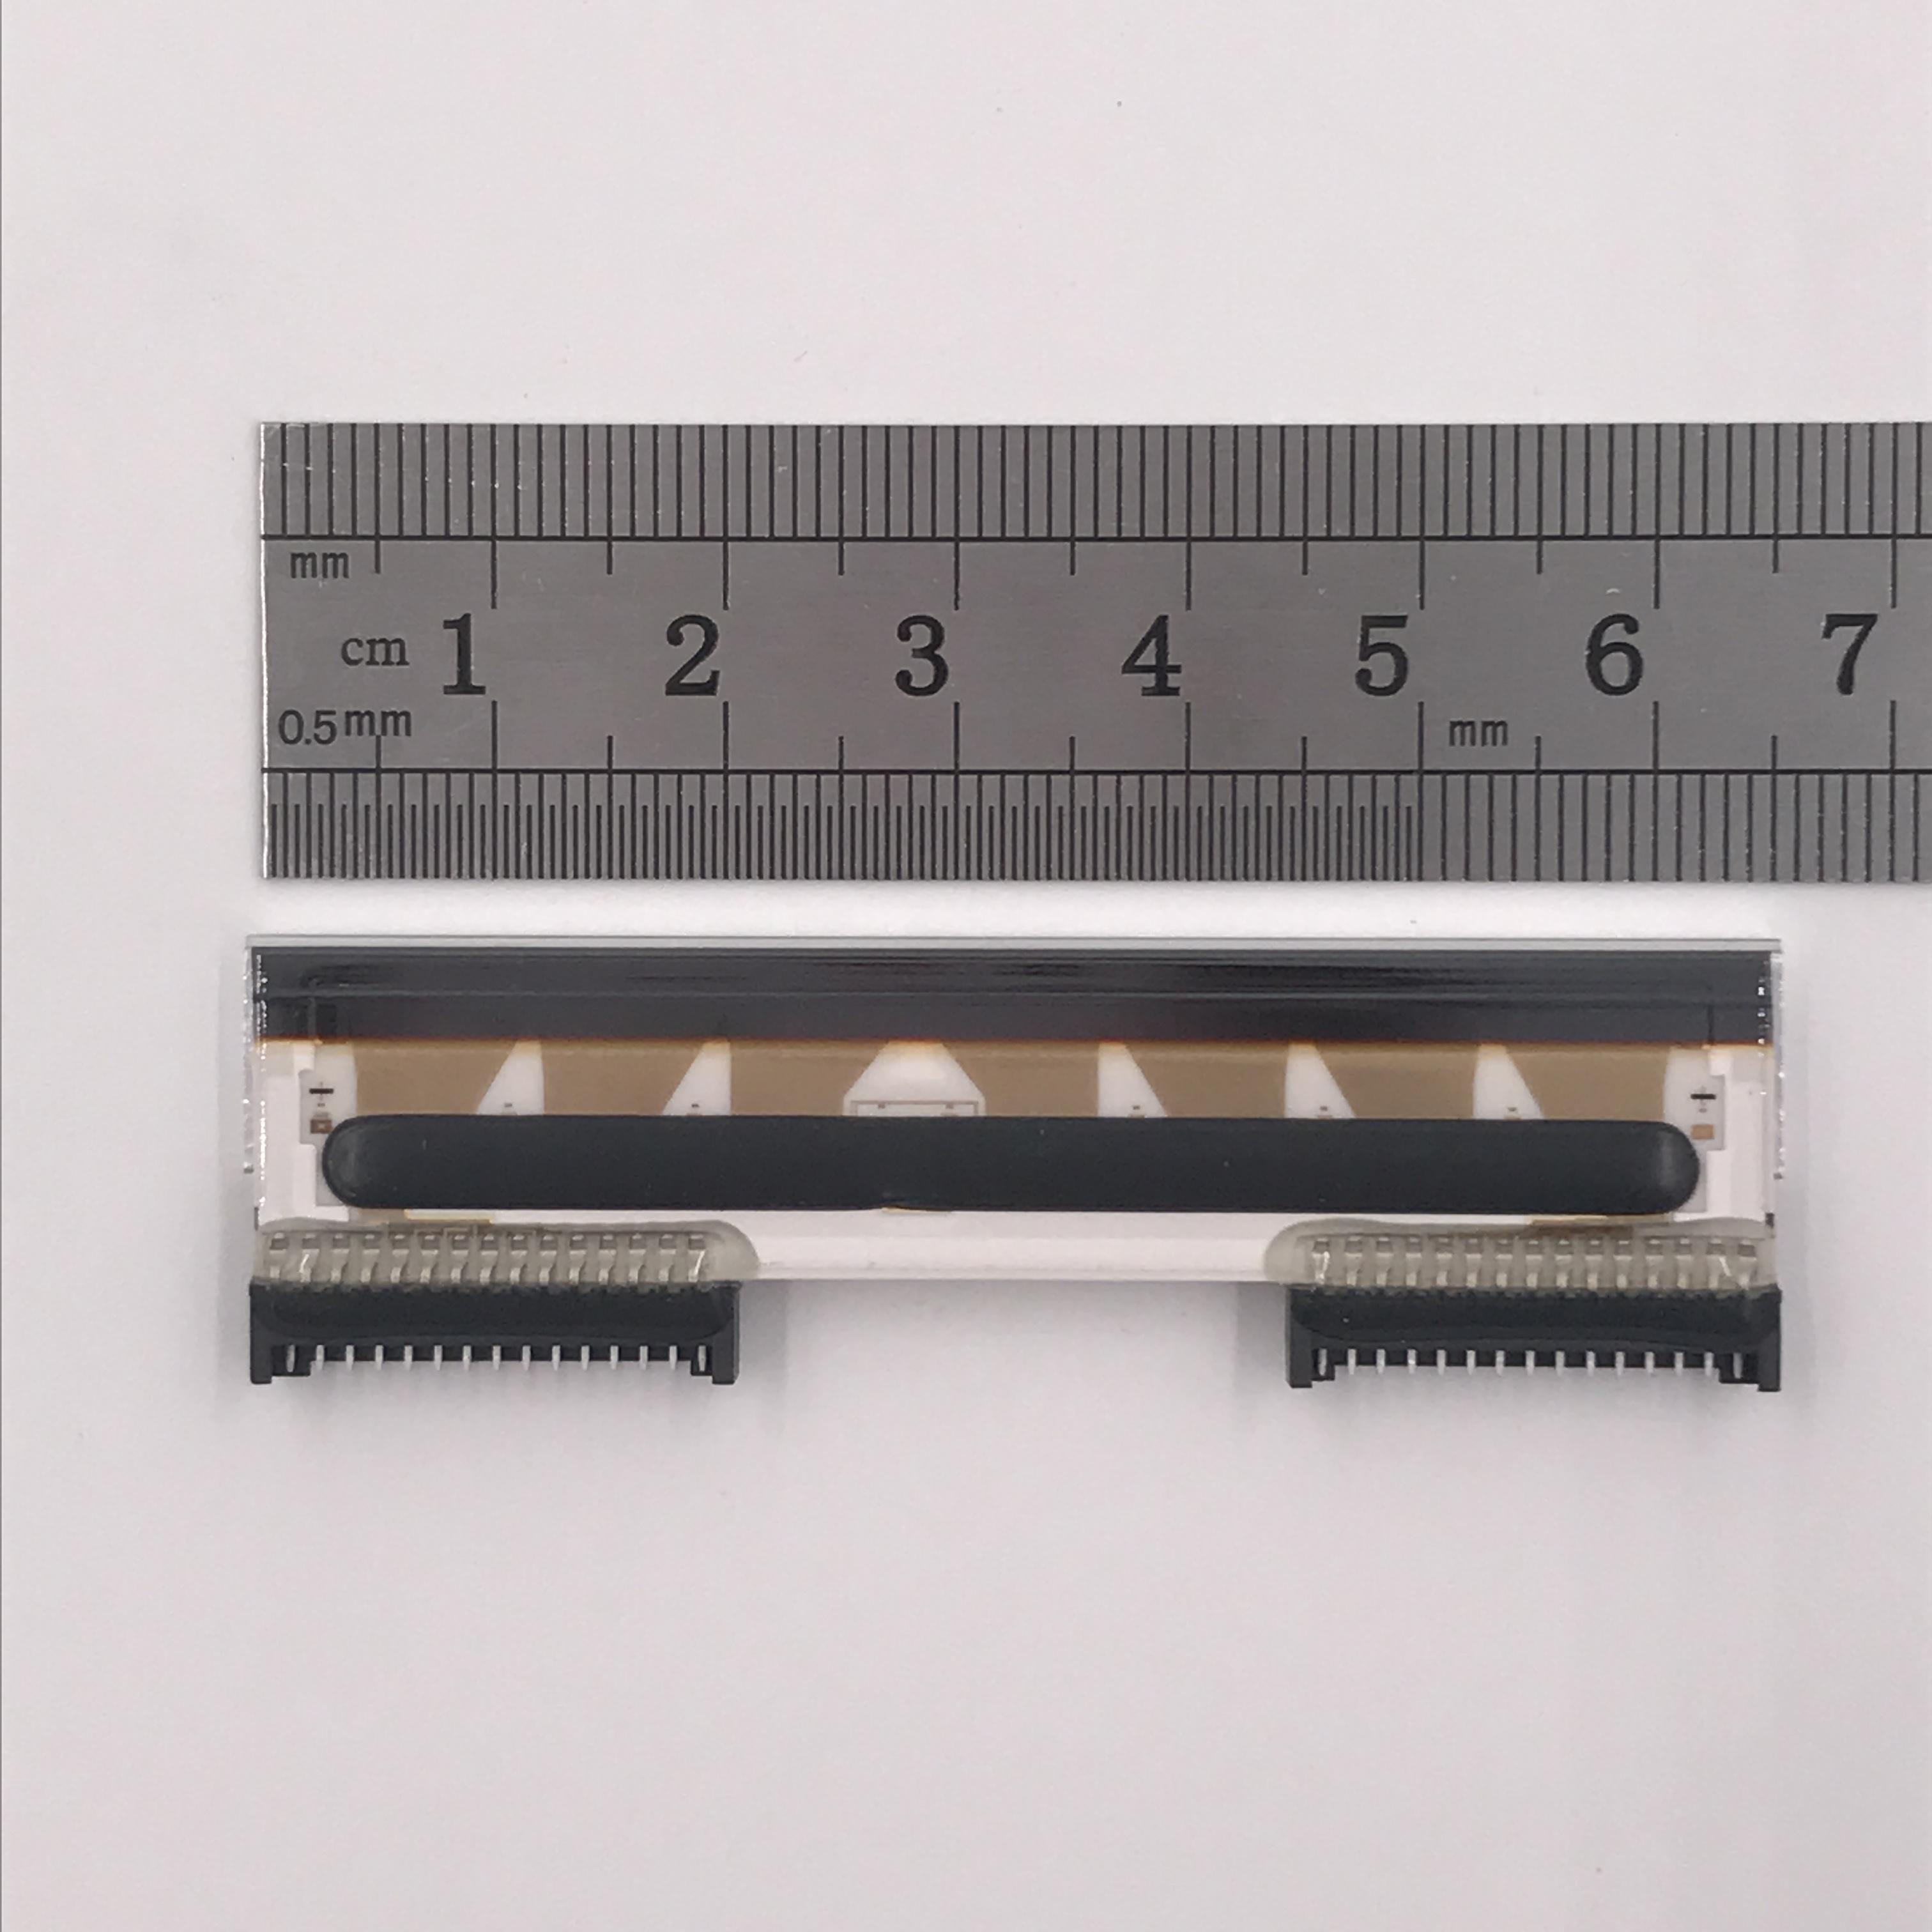 new original printhead thermal print head for toledo 3600 8442 tiger p8442 (KD2002-DF10A, KD2002-DF10Z)